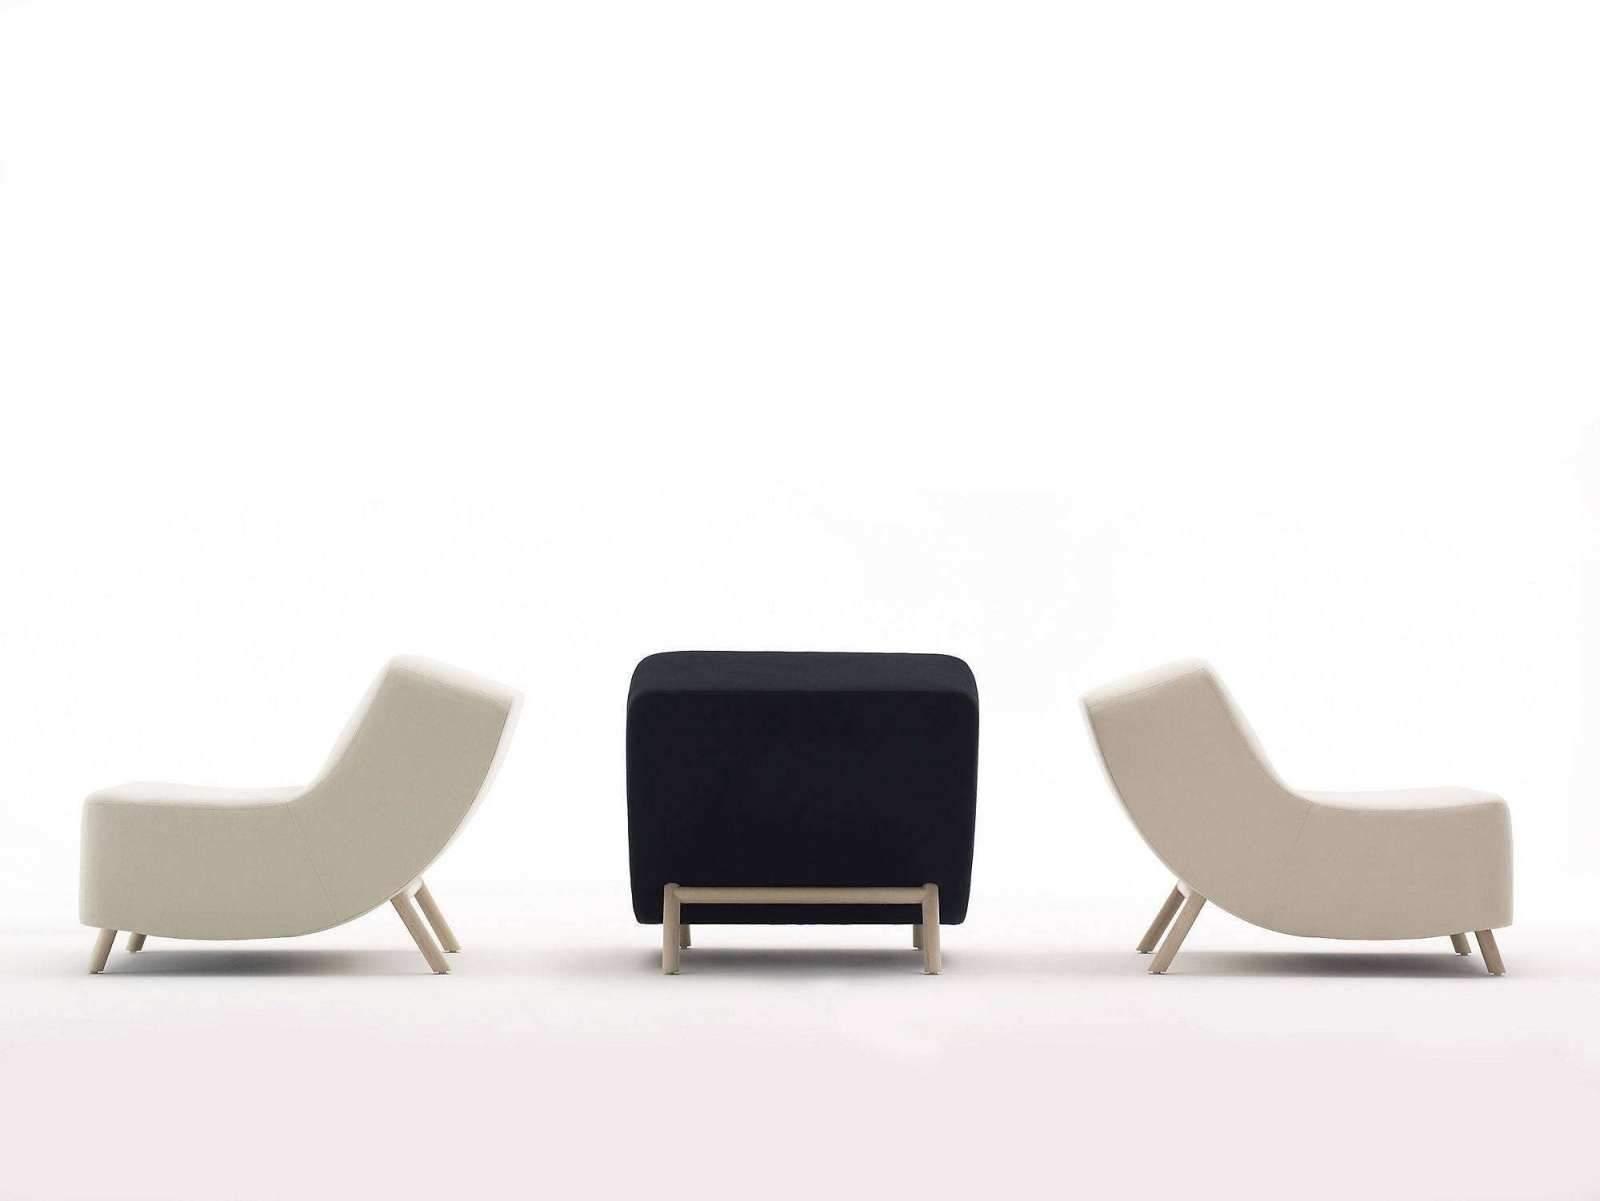 sofa und sessel elegant agha wicker lounge chair agha interiors of sofa und sessel